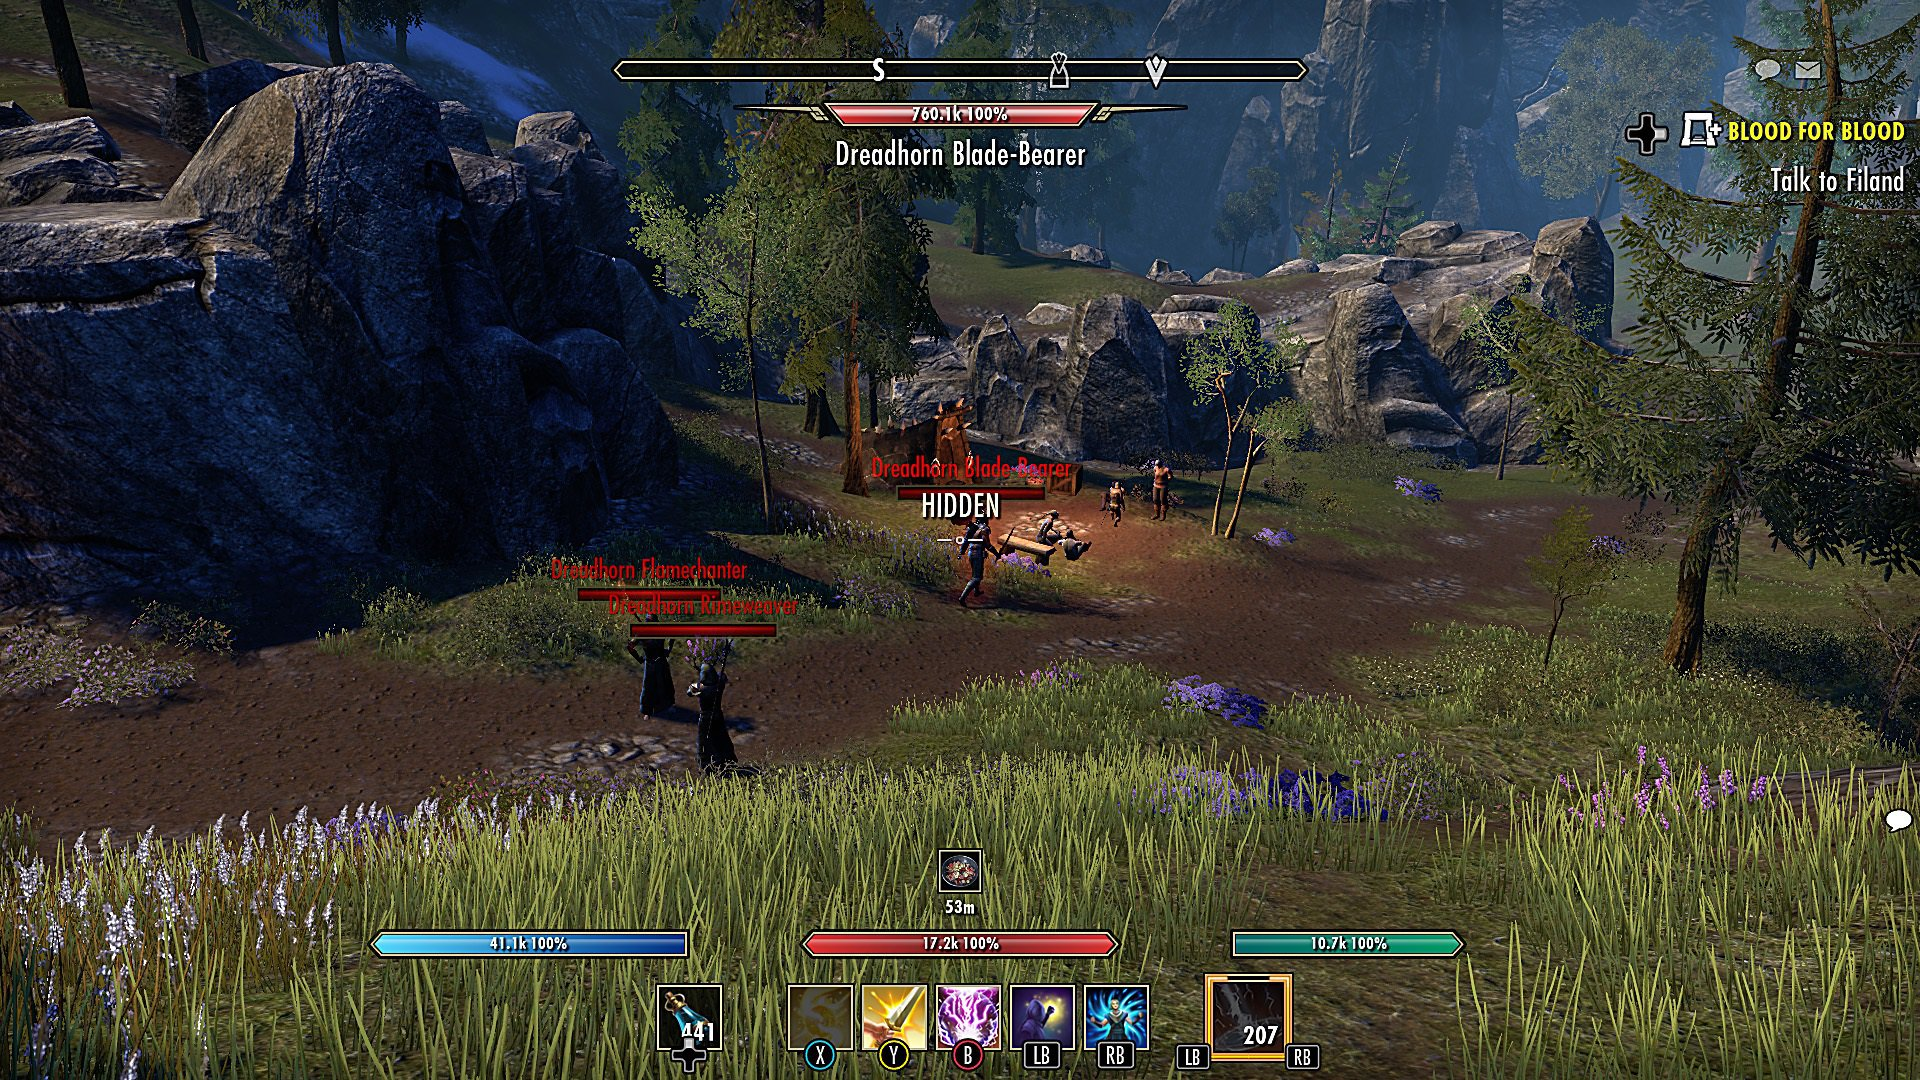 Análisis de The Elder Scrolls Online: Morrowind